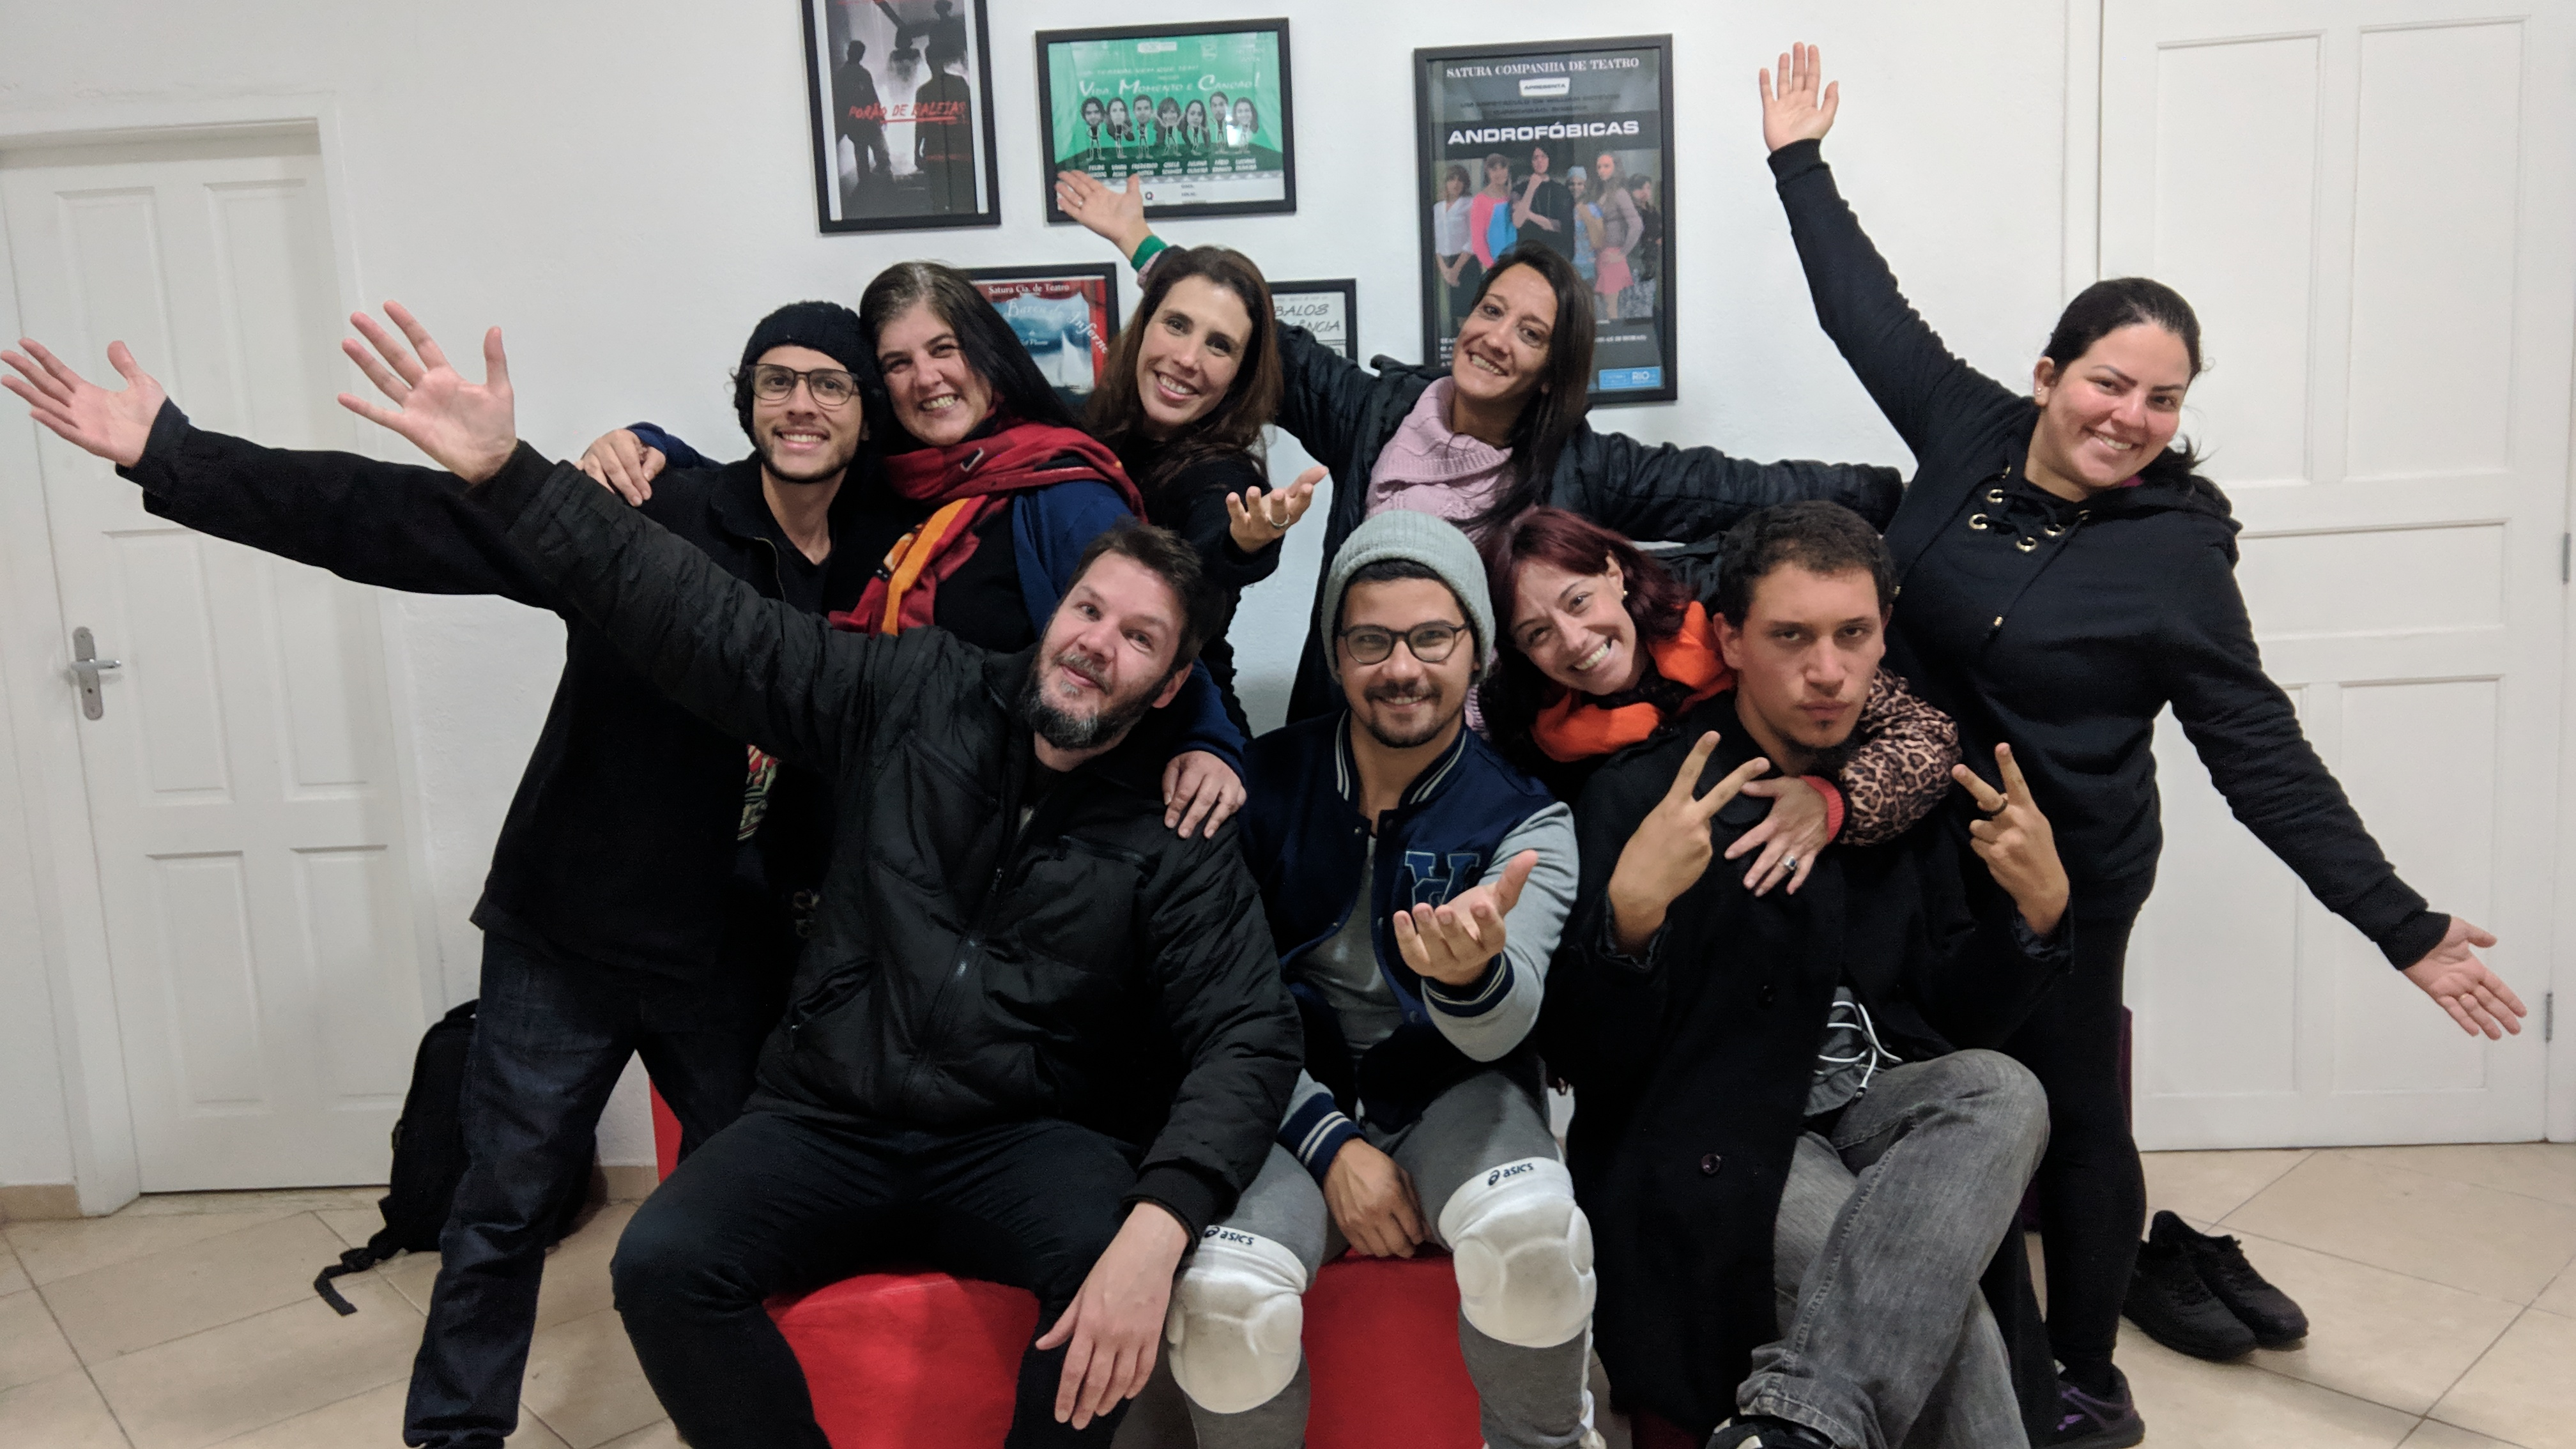 Satura Companhia de Teatro